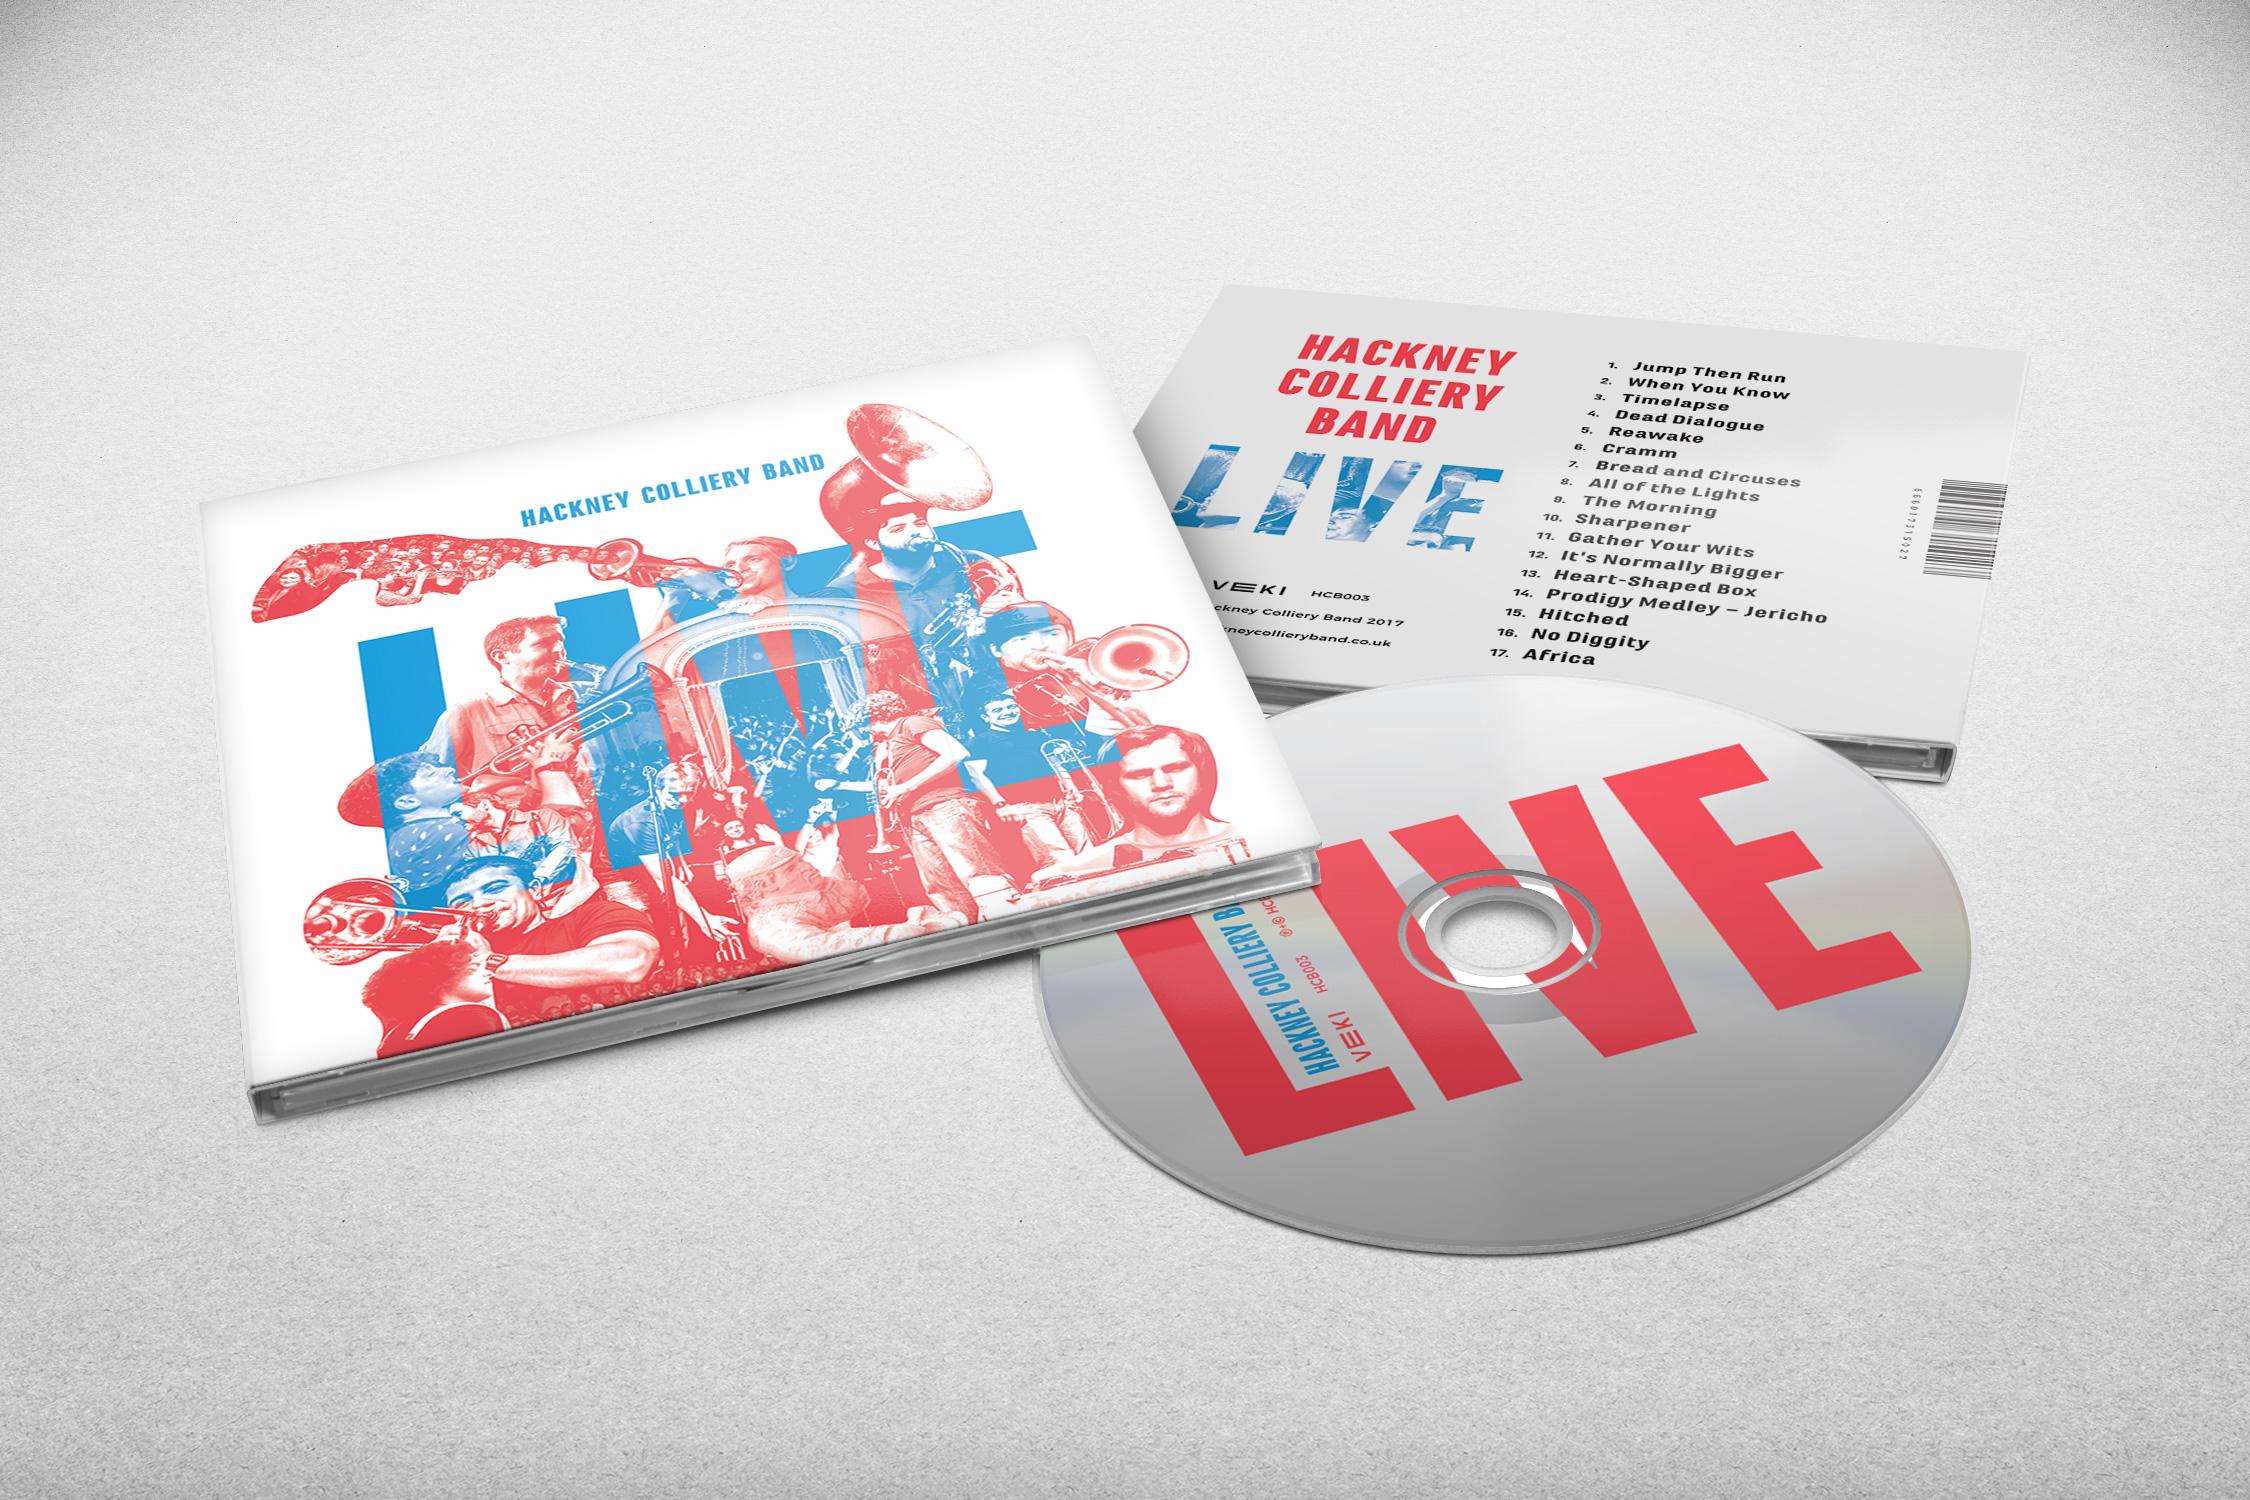 Live album mock up